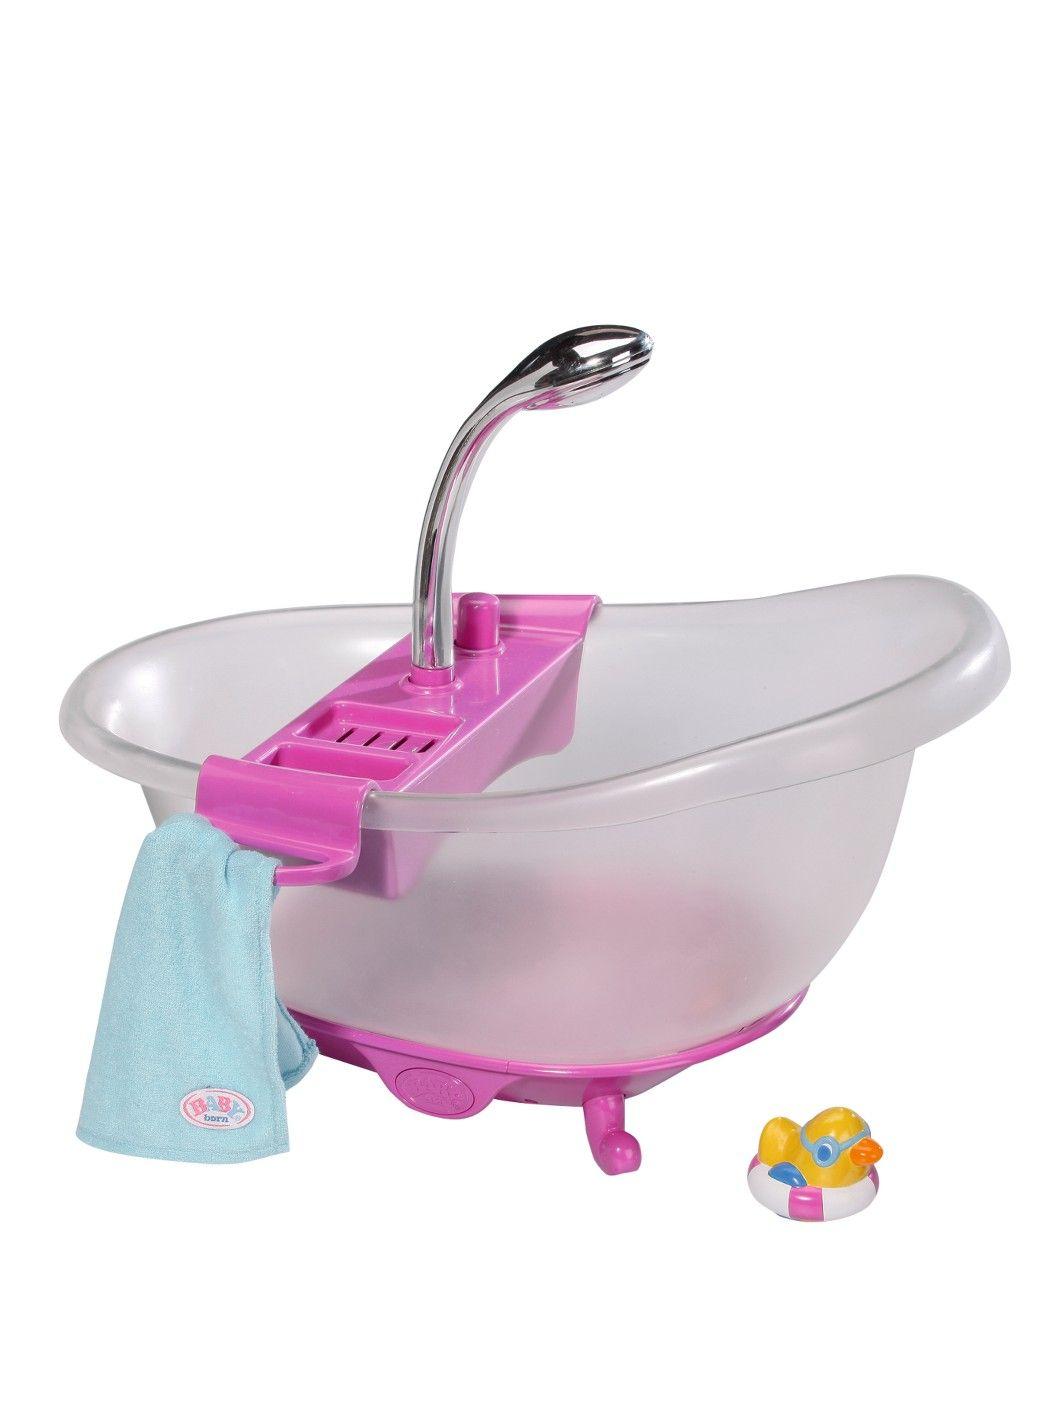 Baby Born Interactive Bath Tub | isme.com | Ayla birthday ...